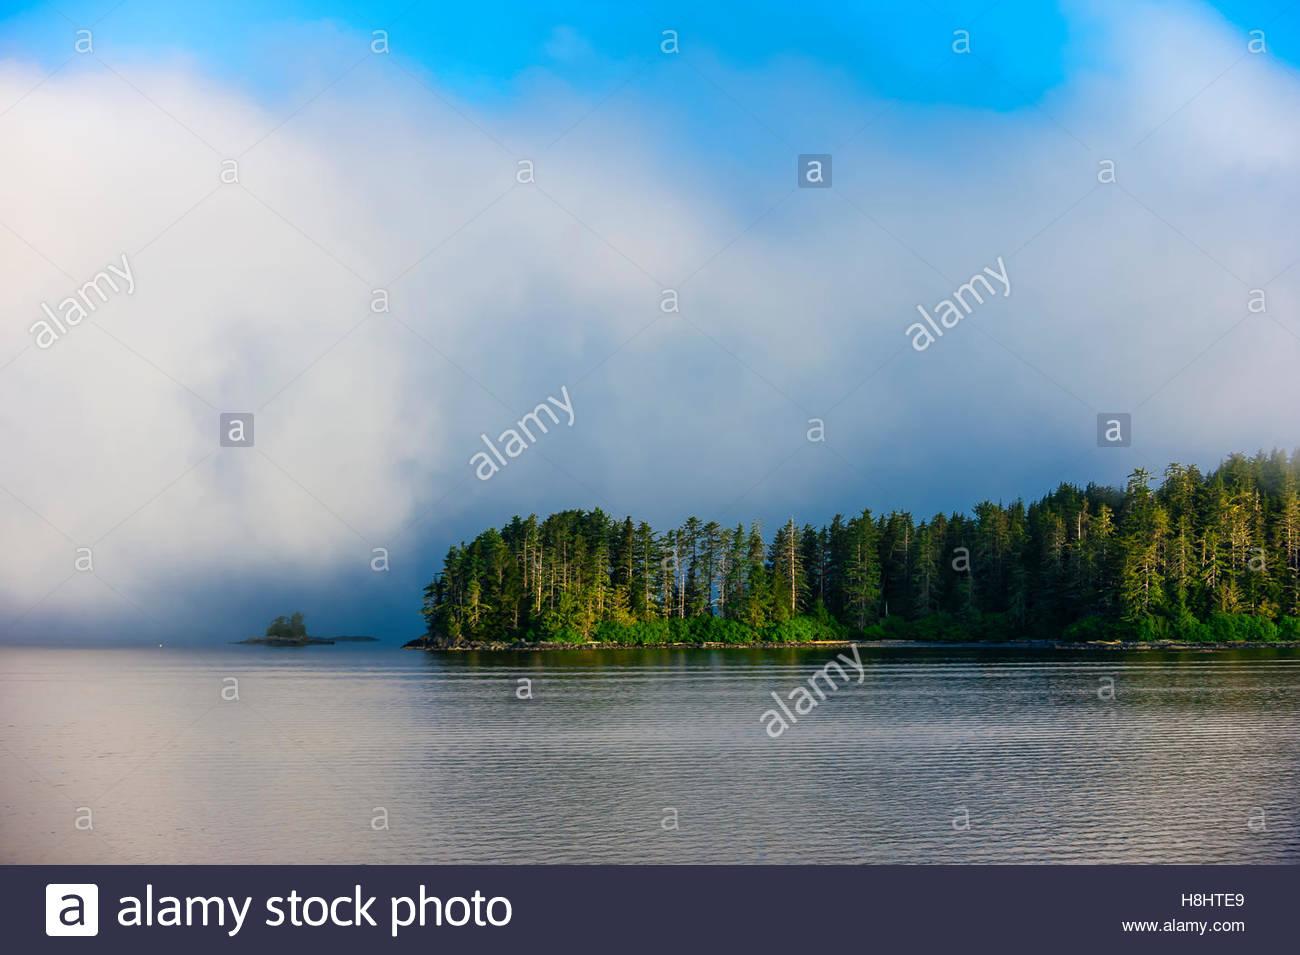 Fog and low hanging clouds, Sitka Sound,  Inside Passage, near Sitka, Alaska USA. - Stock Image